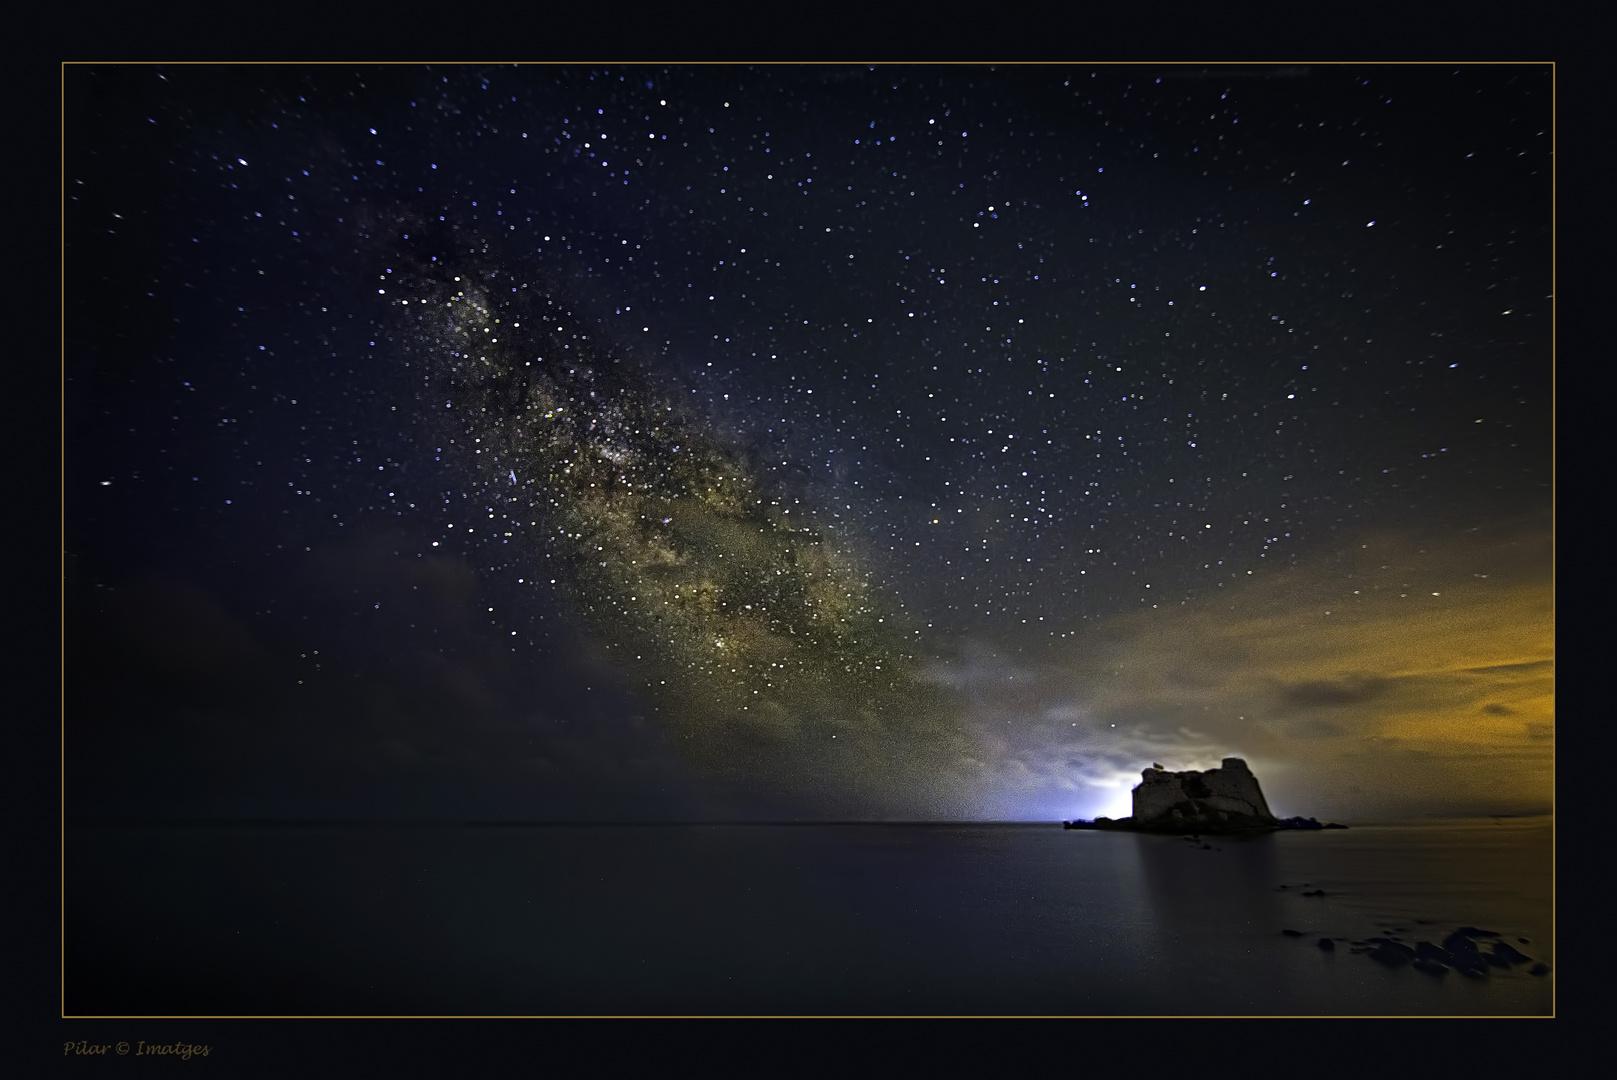 El cielo se llenó de estrellas